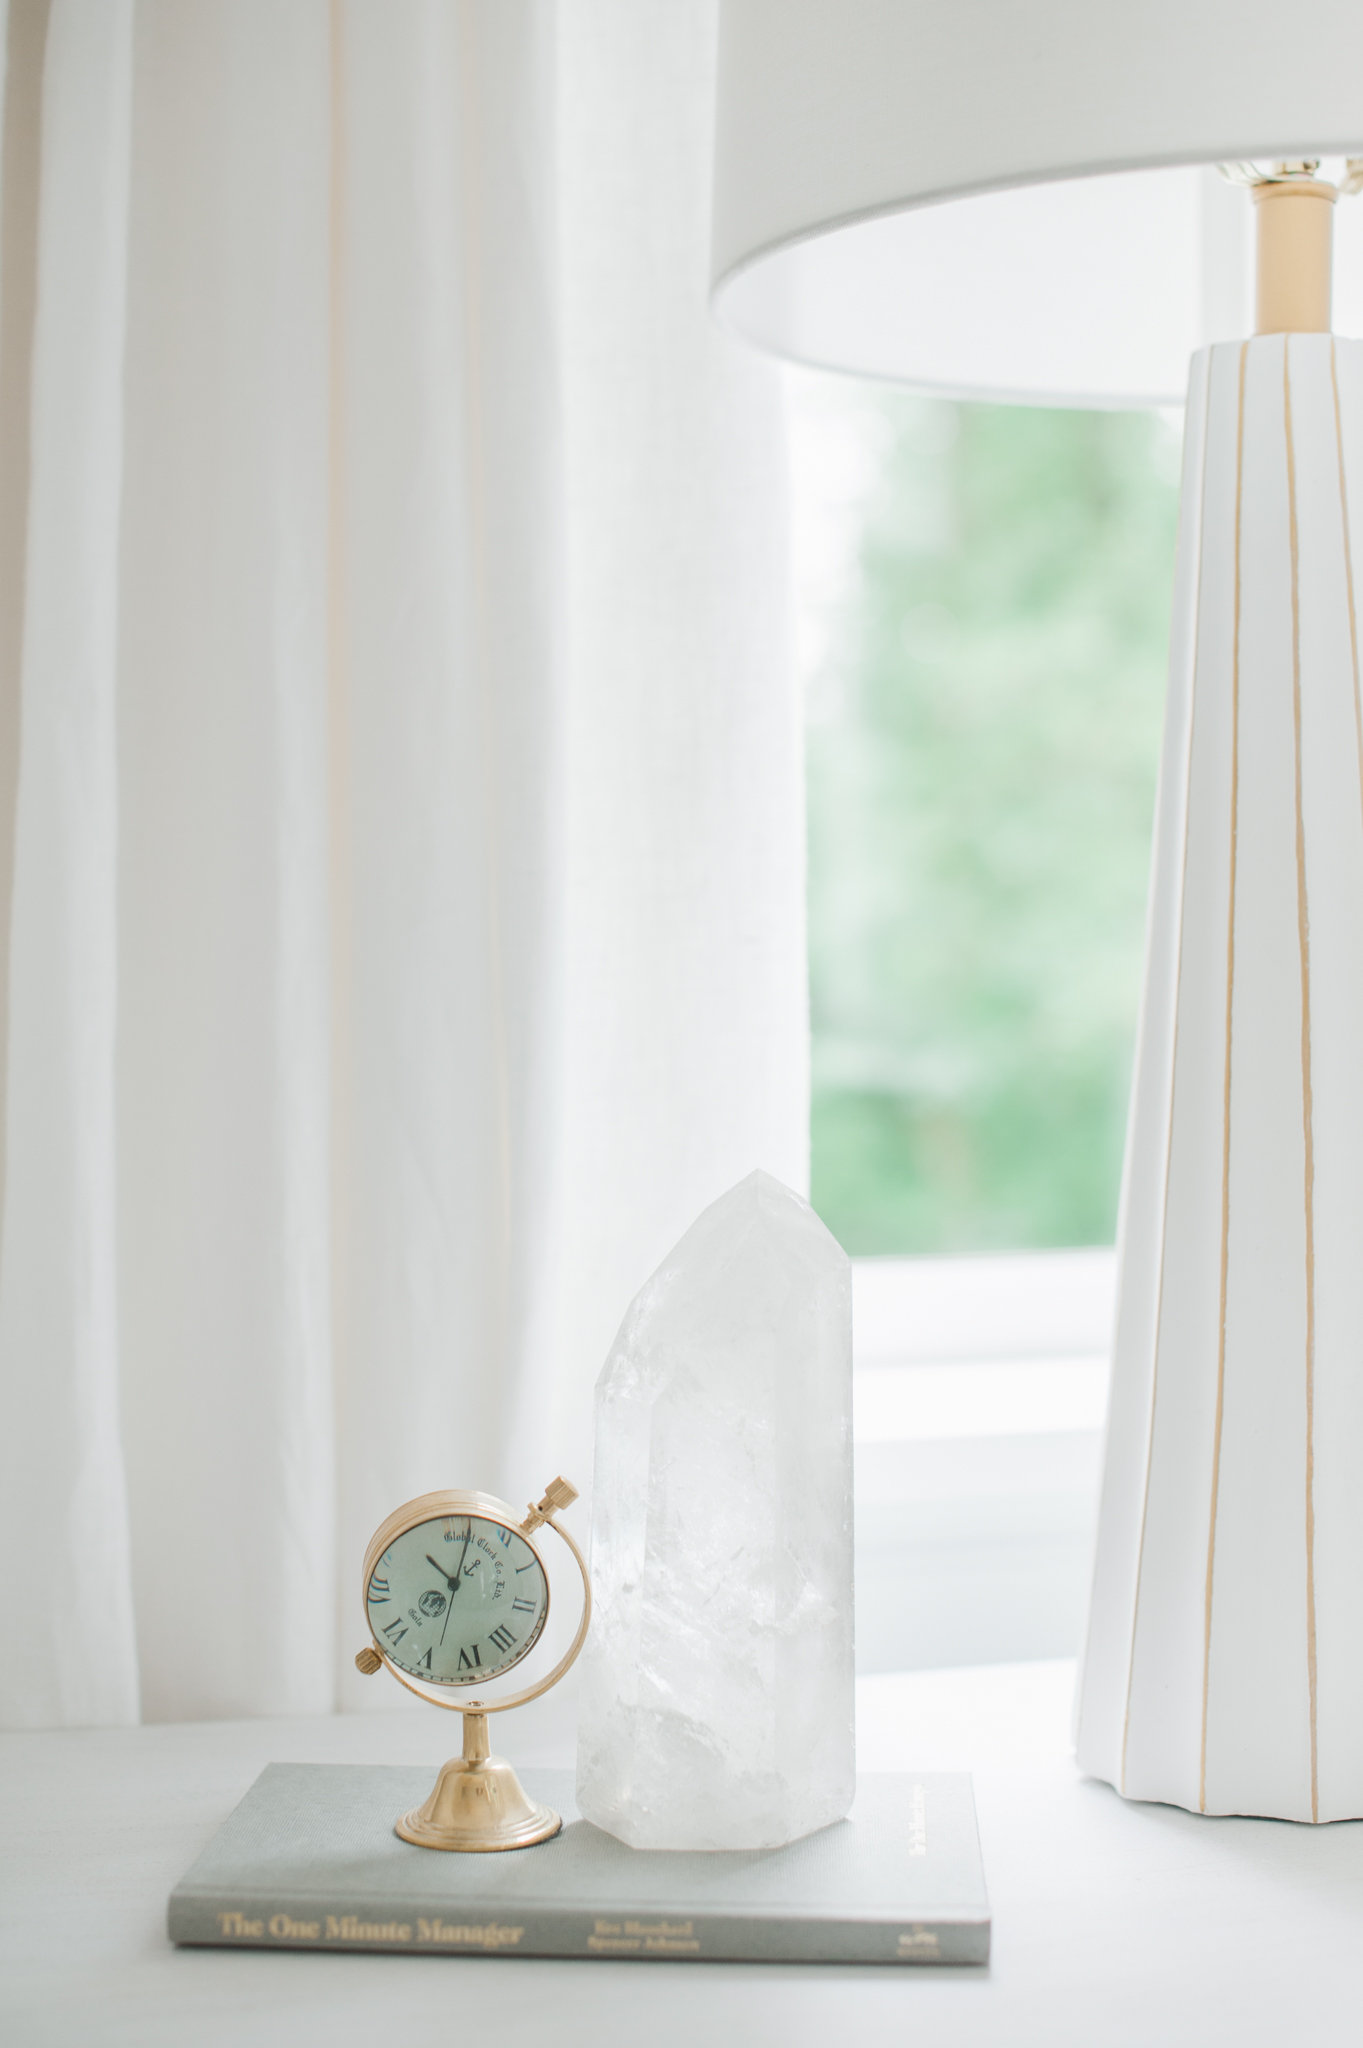 Master Bedroom Night Stand Cross Design MH Home Monika Hibbs